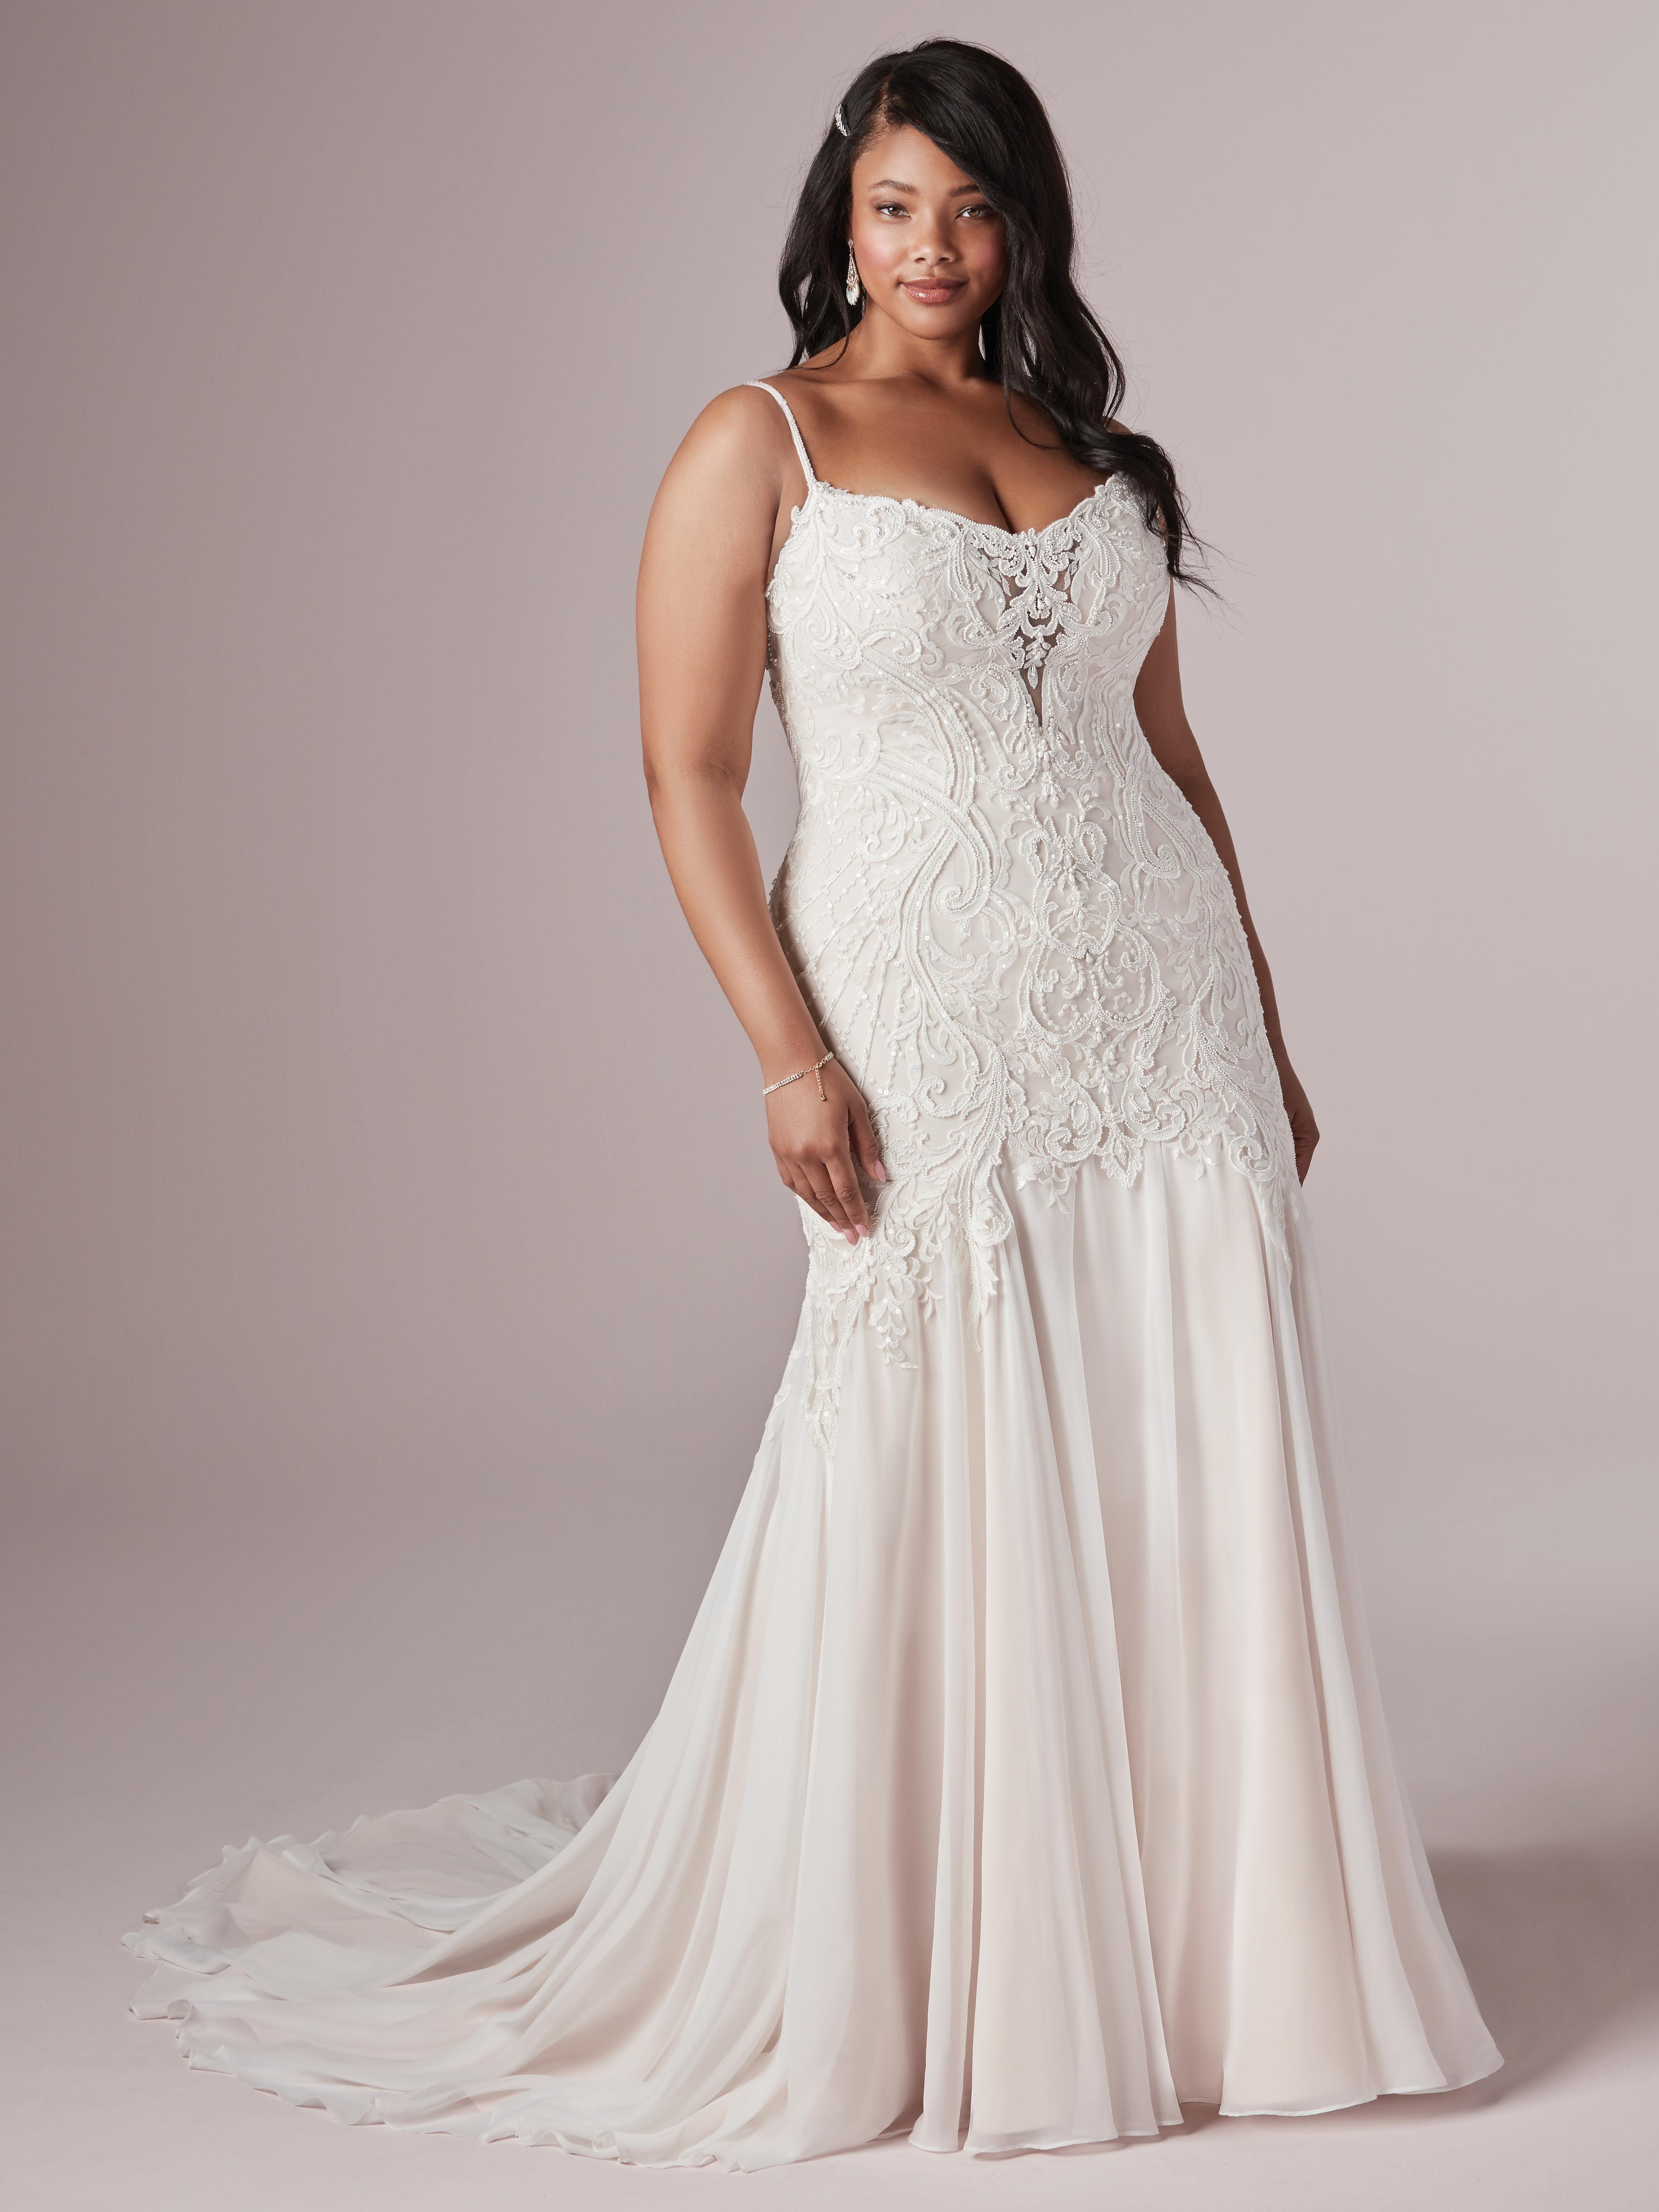 Plus Size Model Wearing Sheath Wedding Dress Called Corrine by Rebecca Ingram